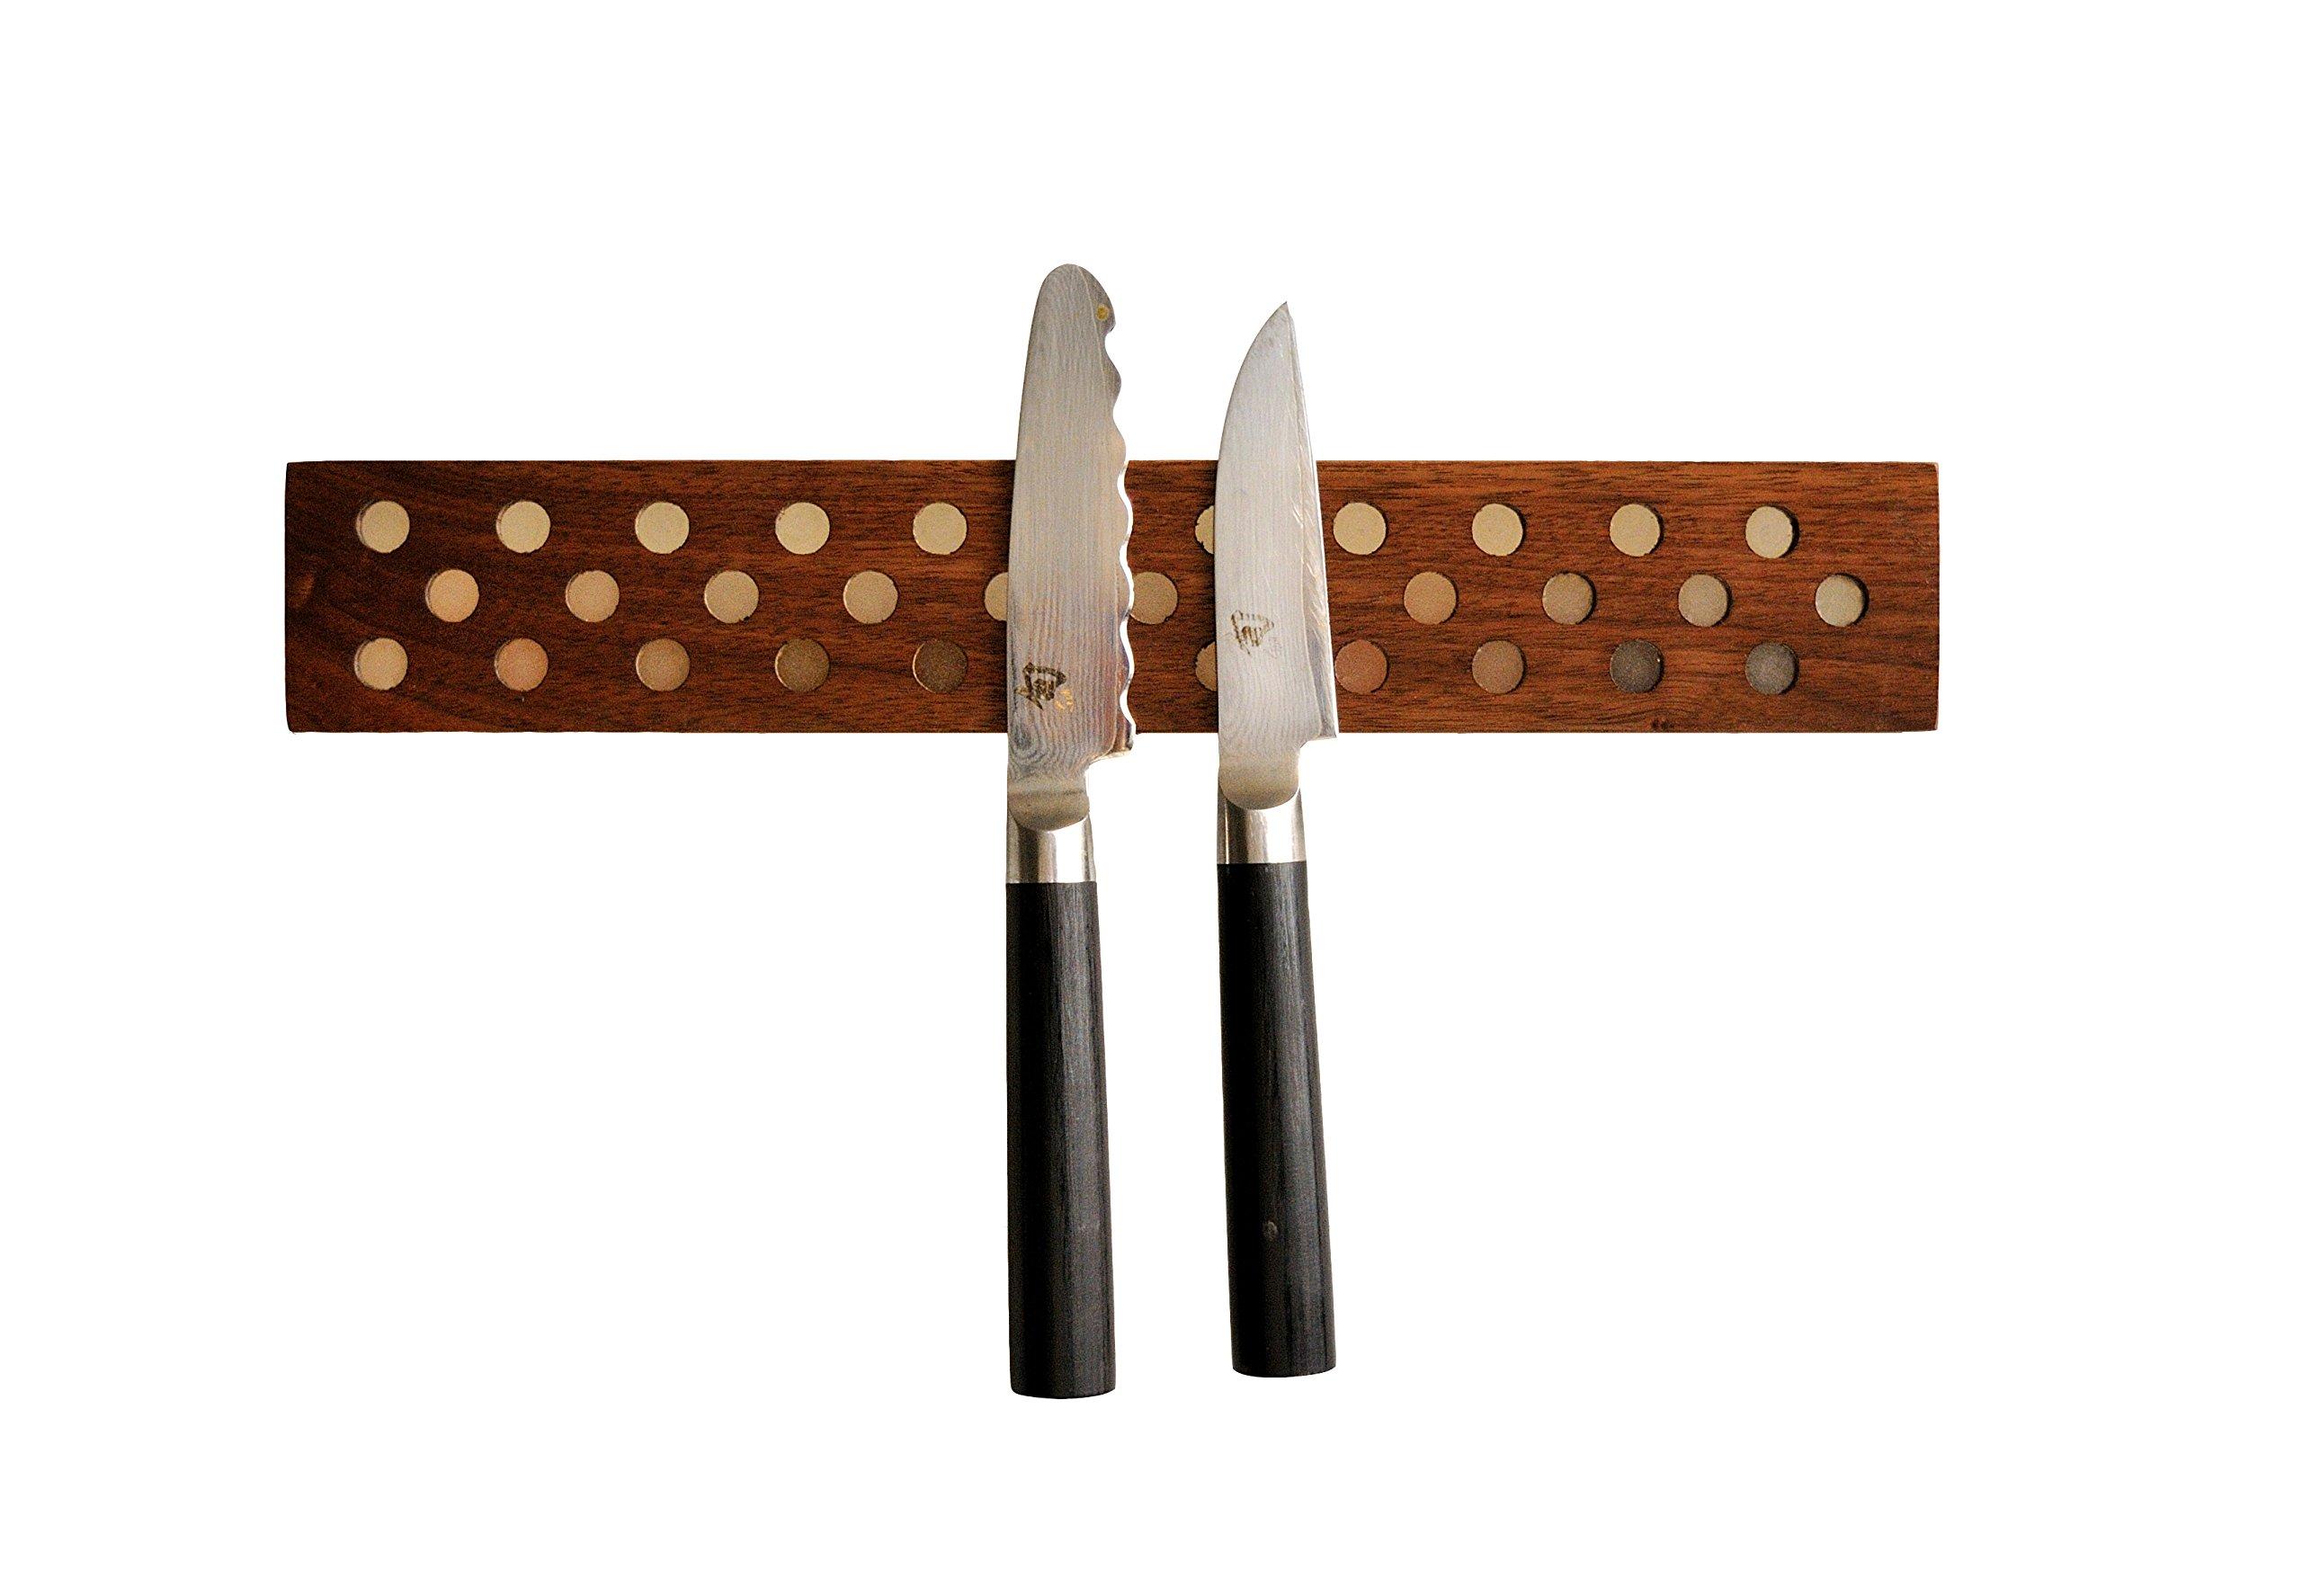 Magnetic Wooden Knife Bar Holder: 12 INCH WALNUT, Danish Design Inspired by Jonathan Alden (Image #1)